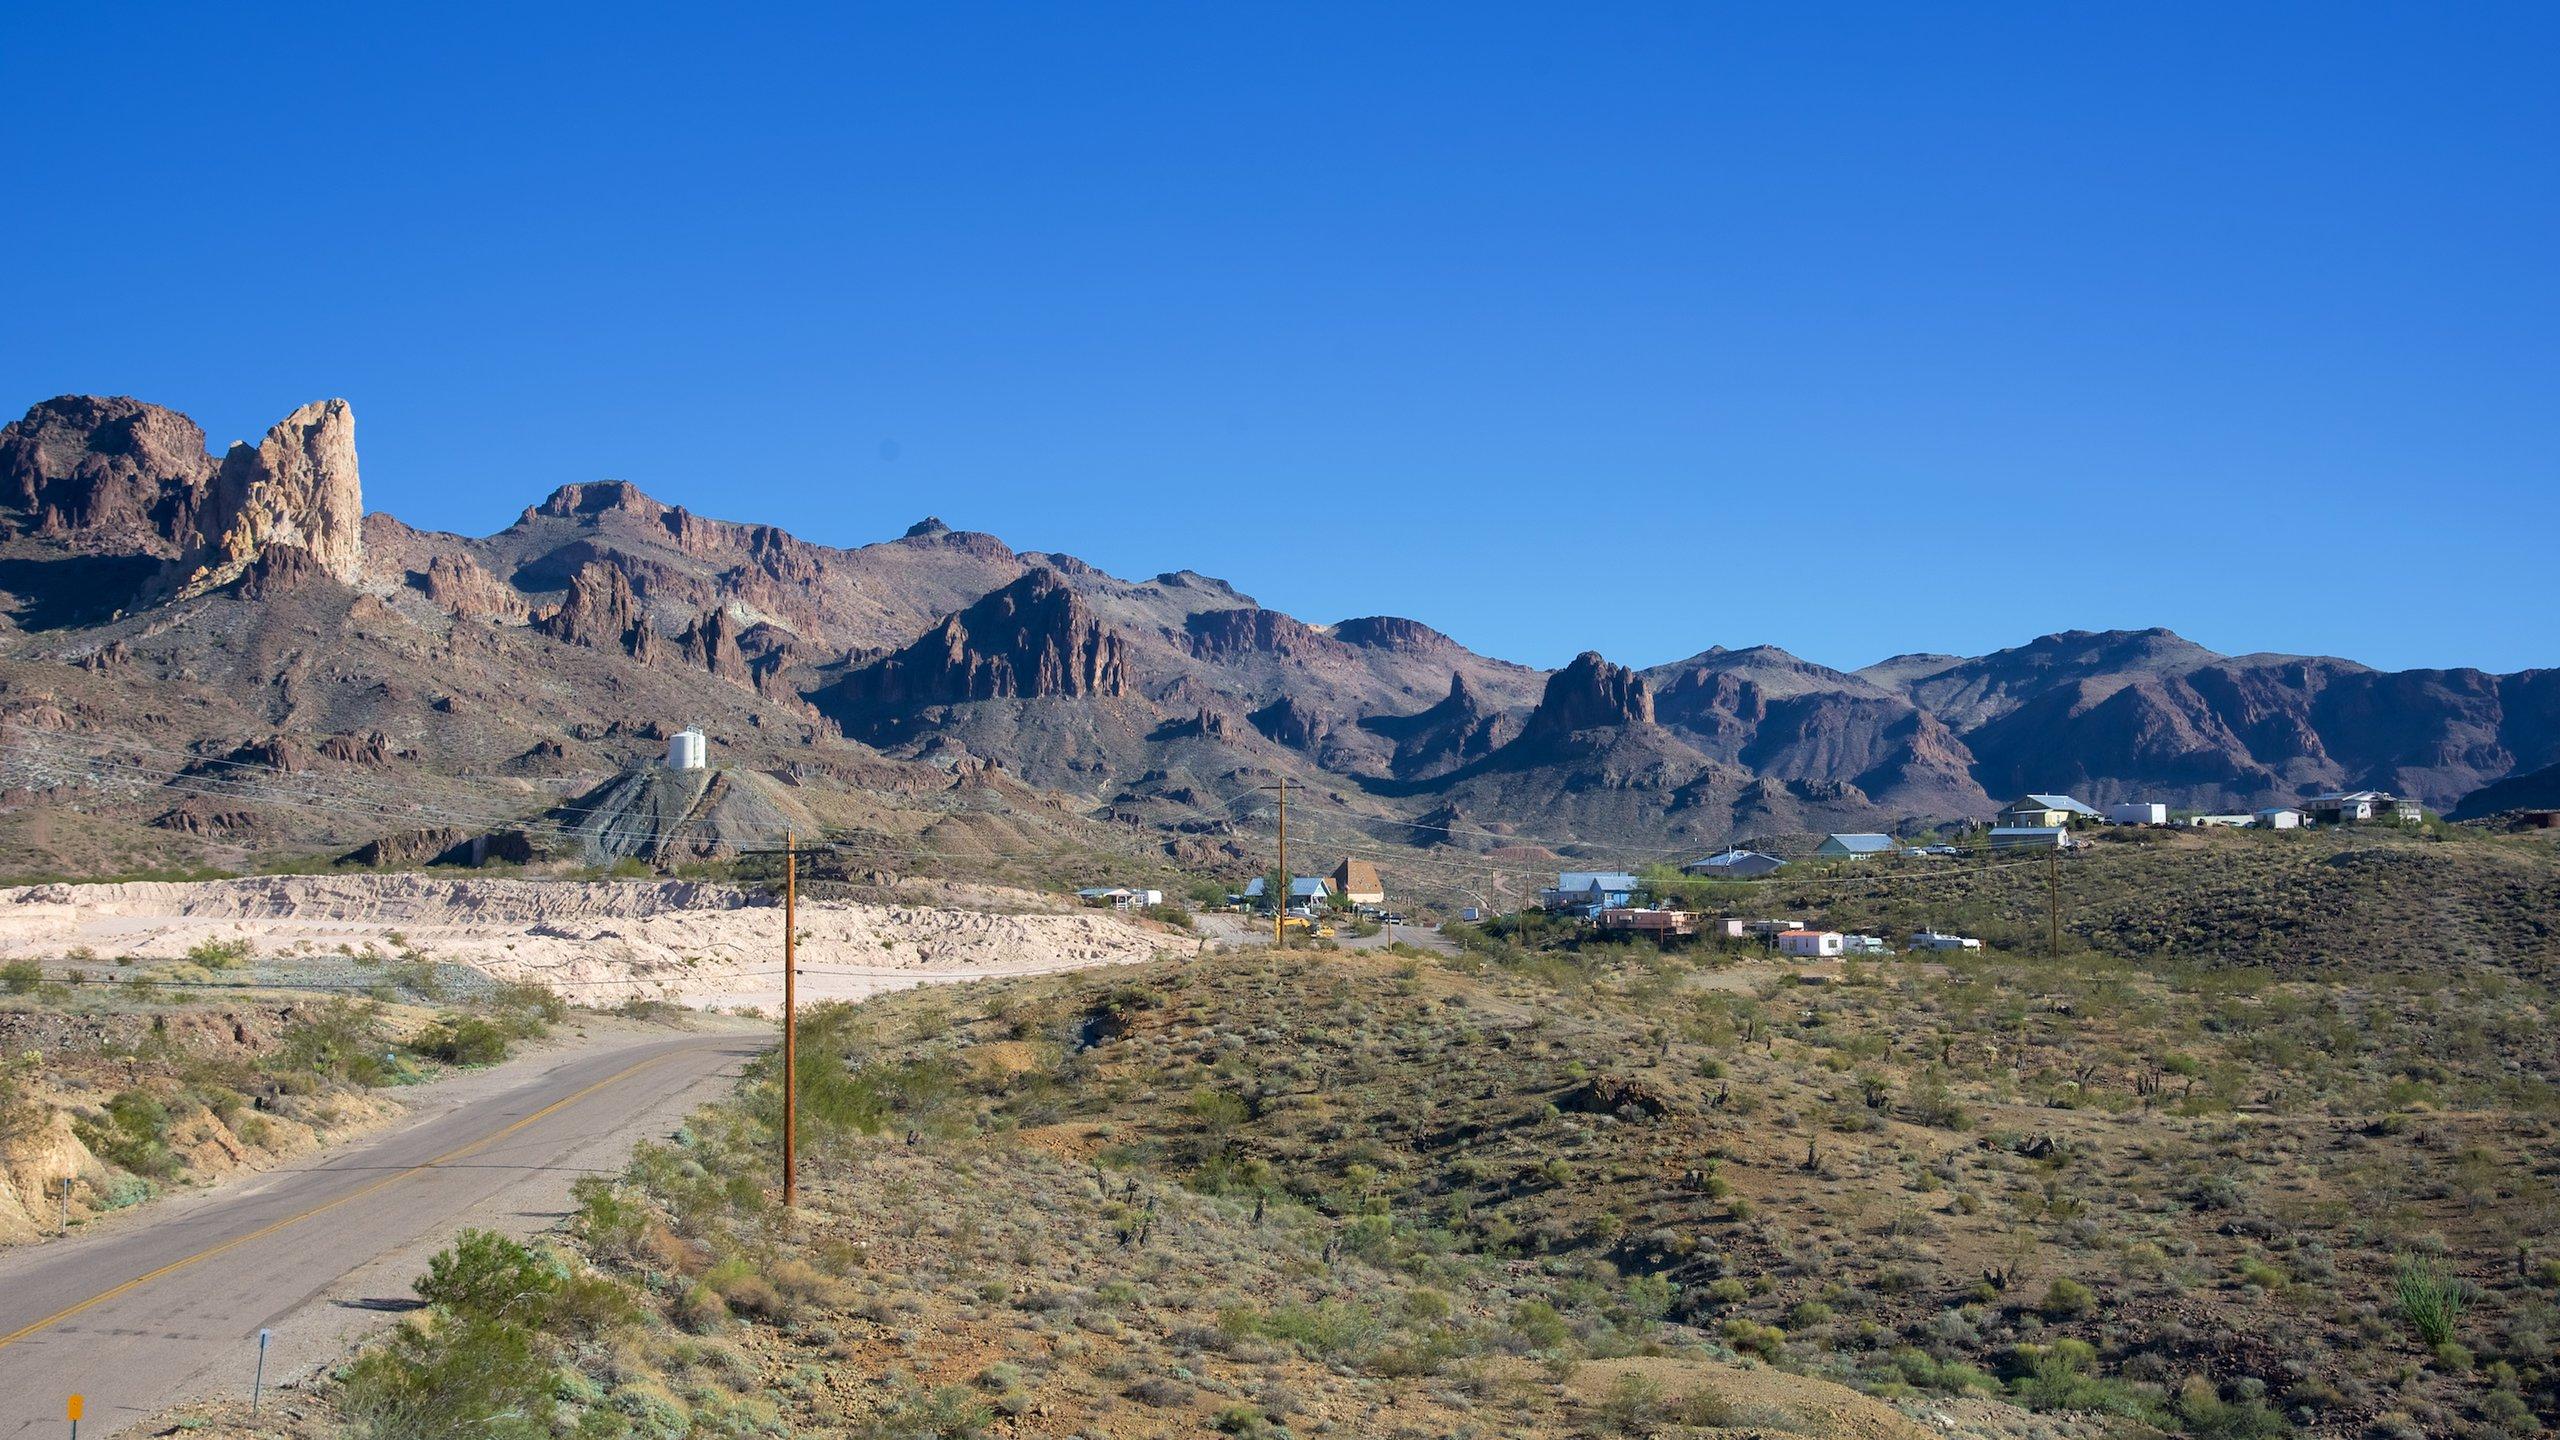 Bullhead City, Arizona, United States of America